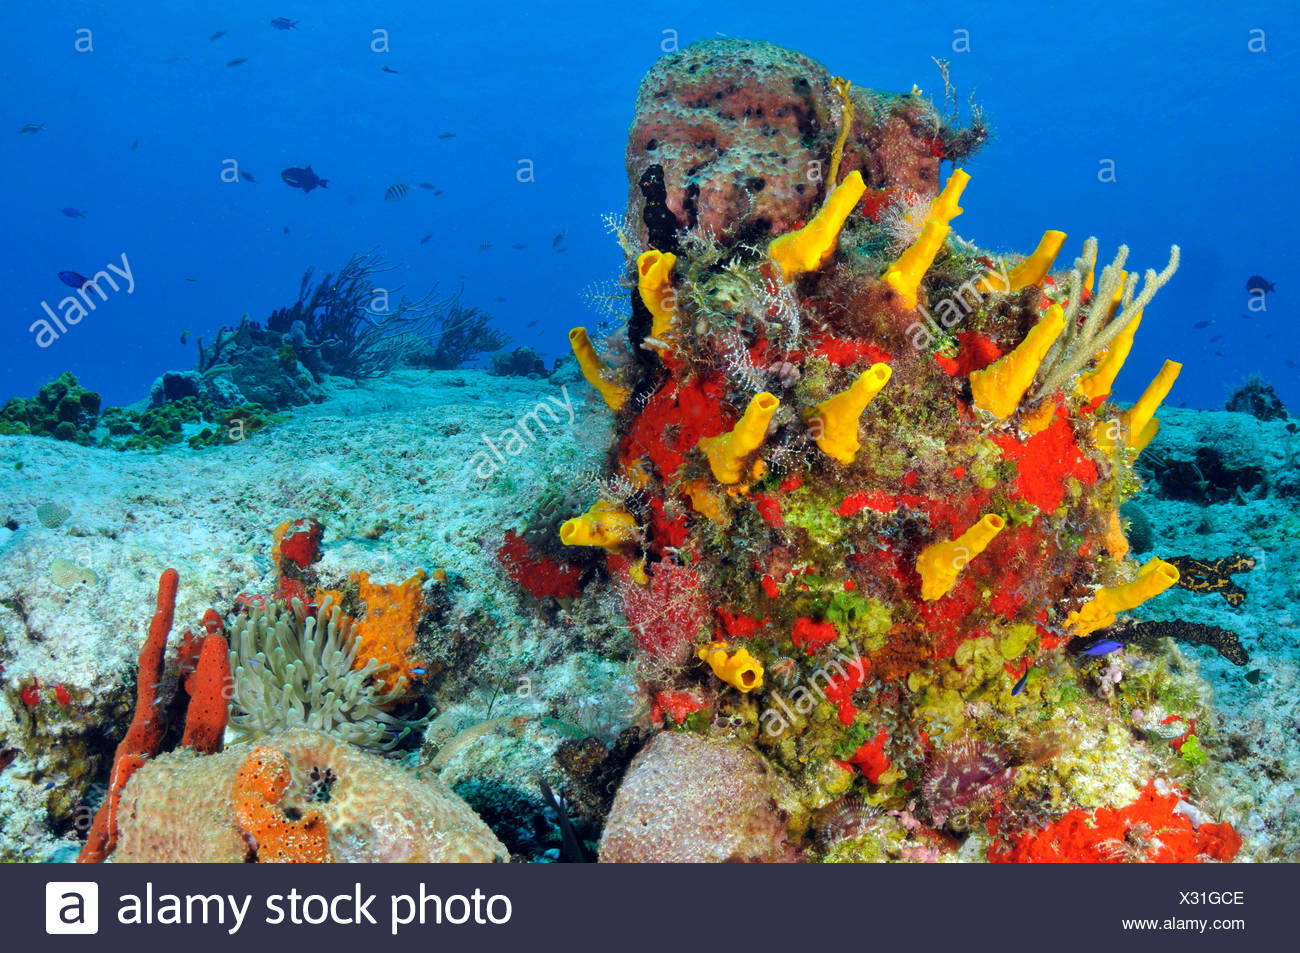 Karibische Korallenriff, Cozumel, Karibik, Mexiko Stockbild